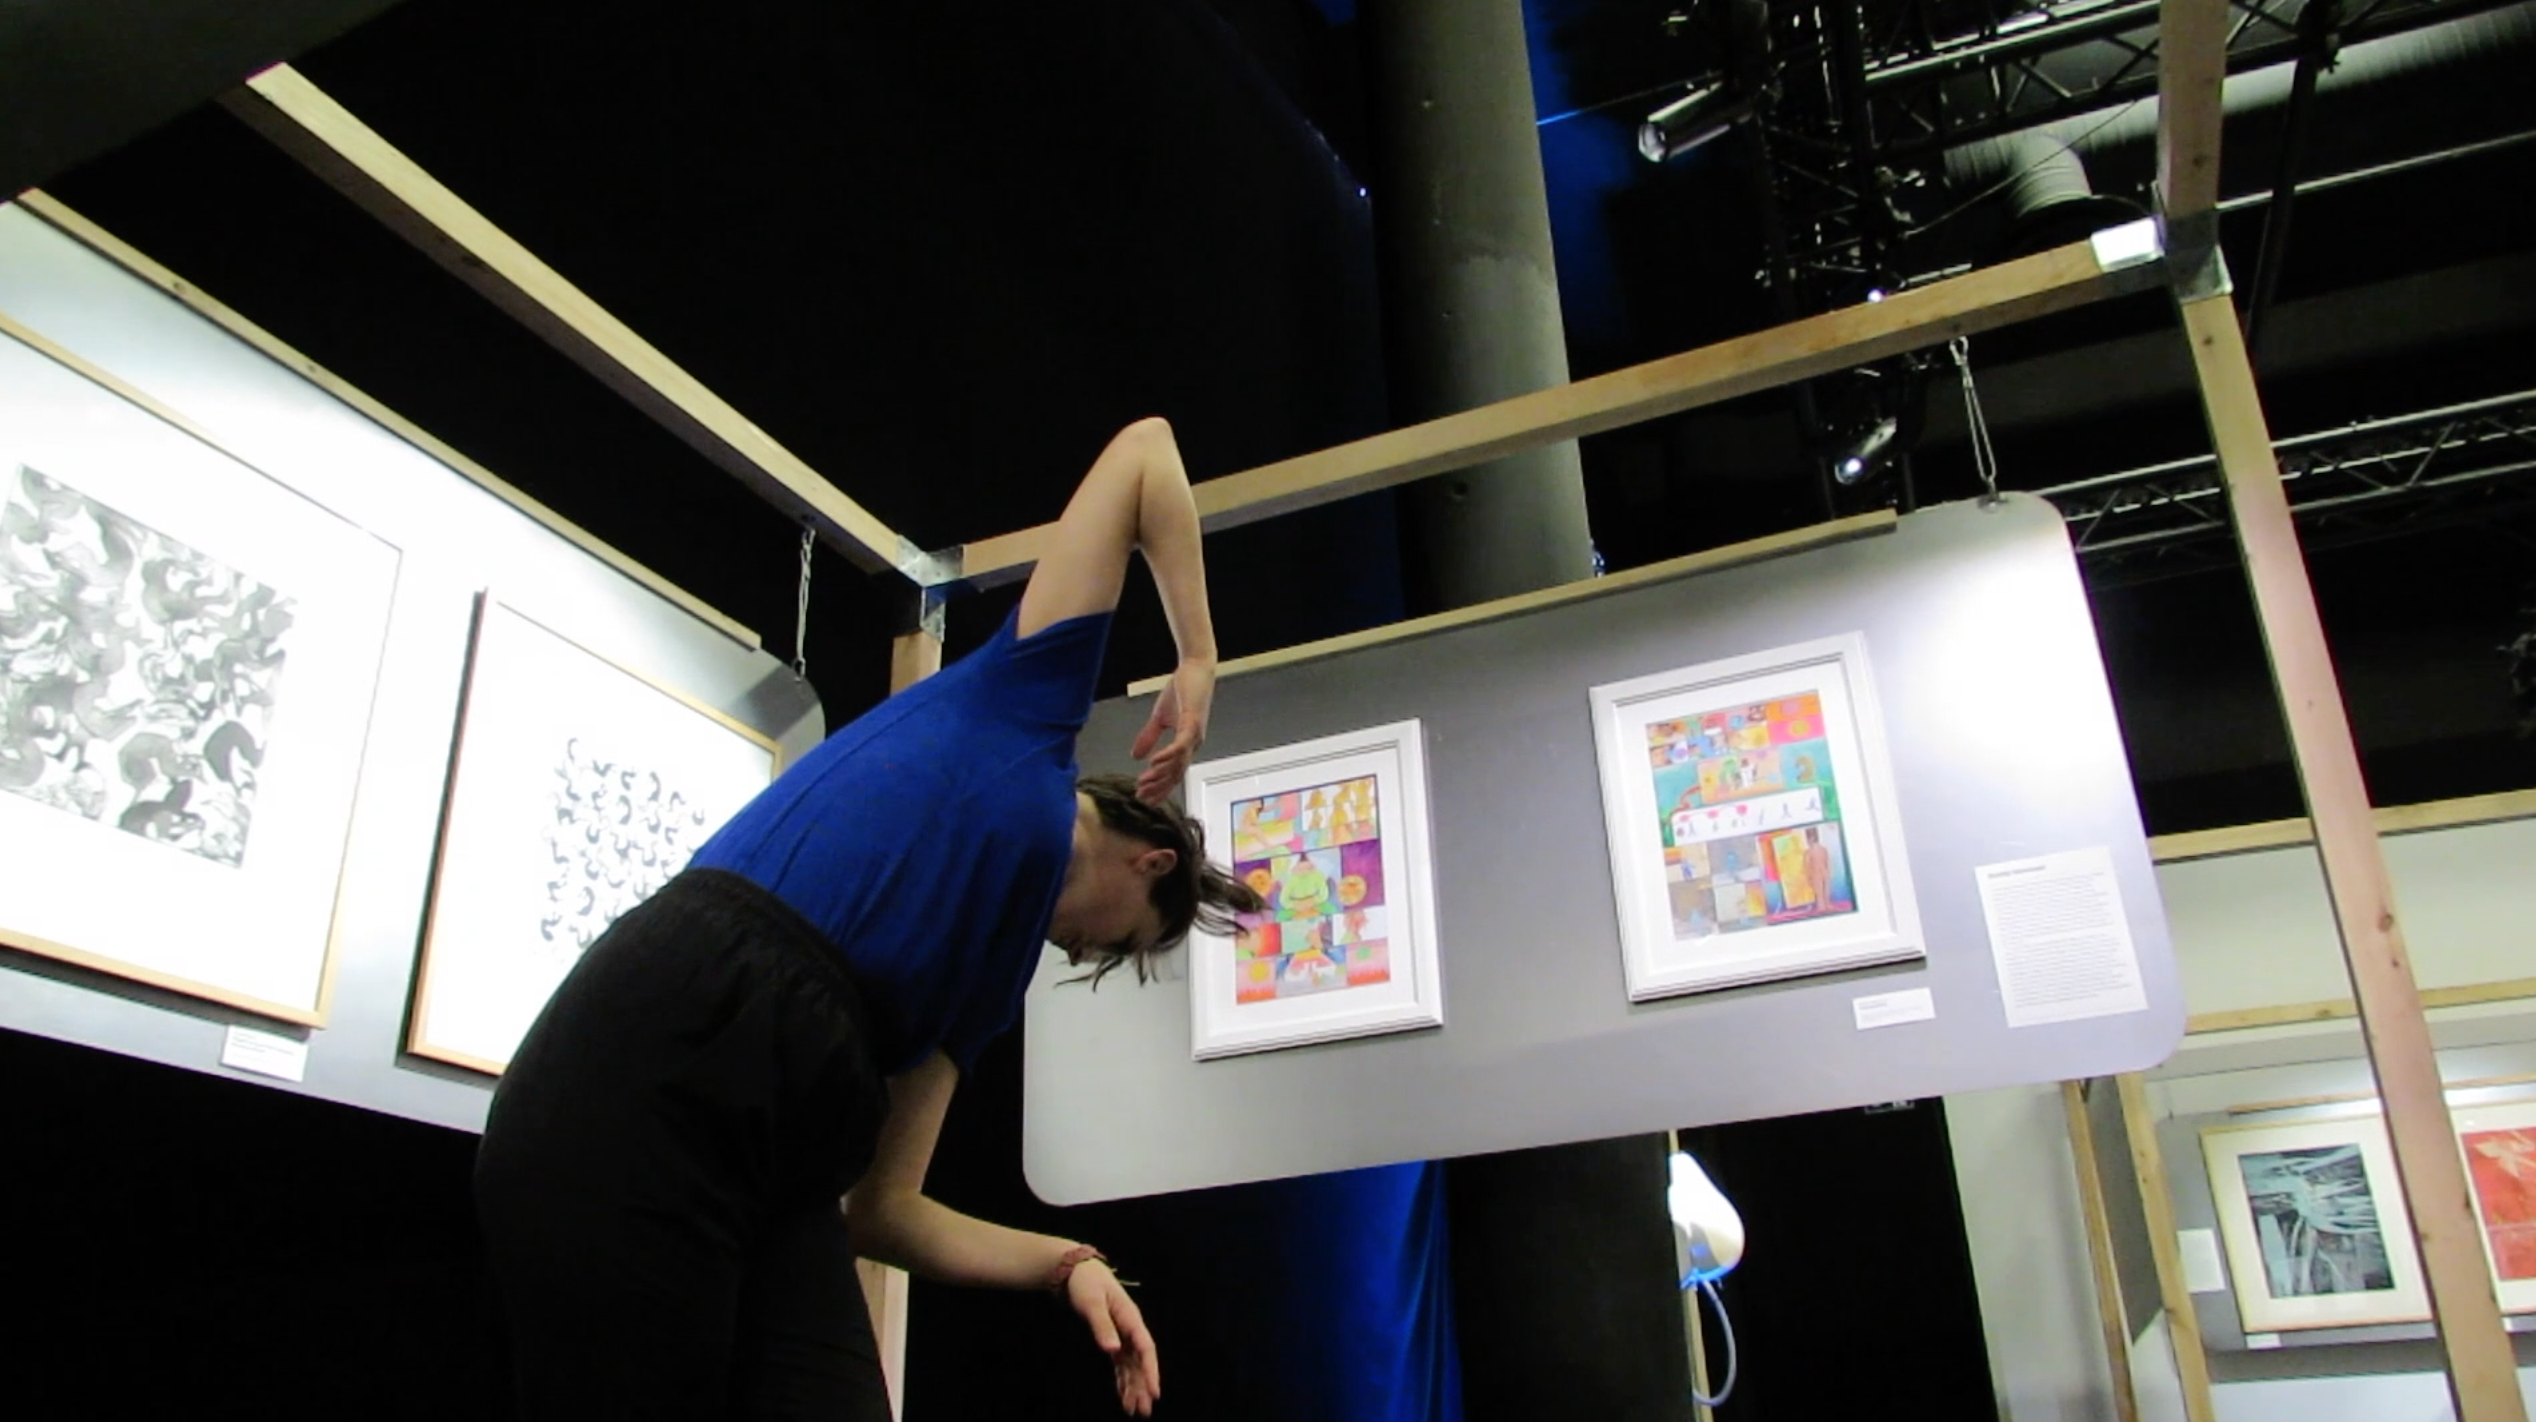 Video dance tutorial workshop with Cléa Hourant